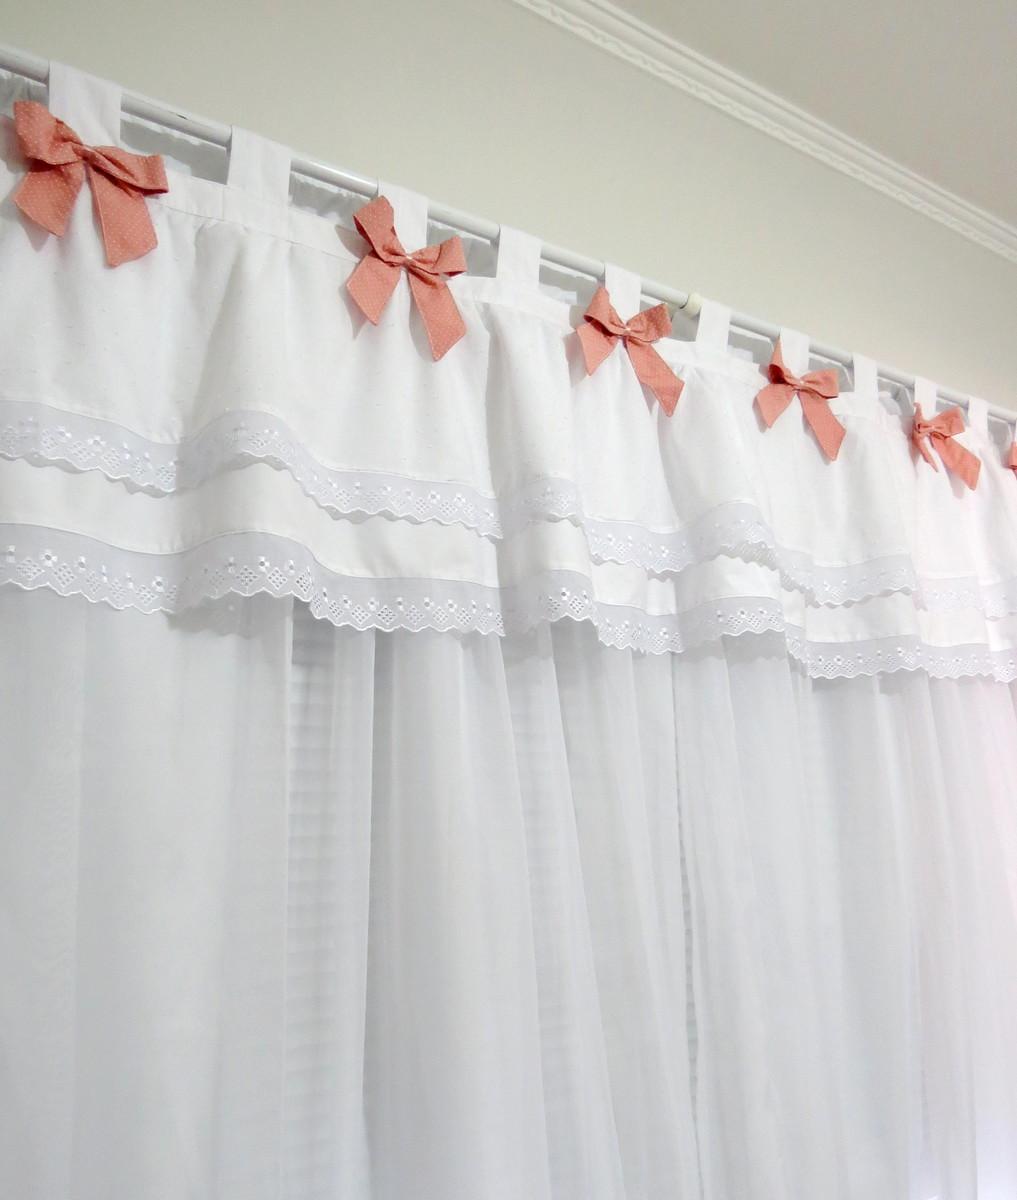 Cortina frufru de lacinhos coloridos no elo7 tia nen m - Modelos de cortinas infantiles ...